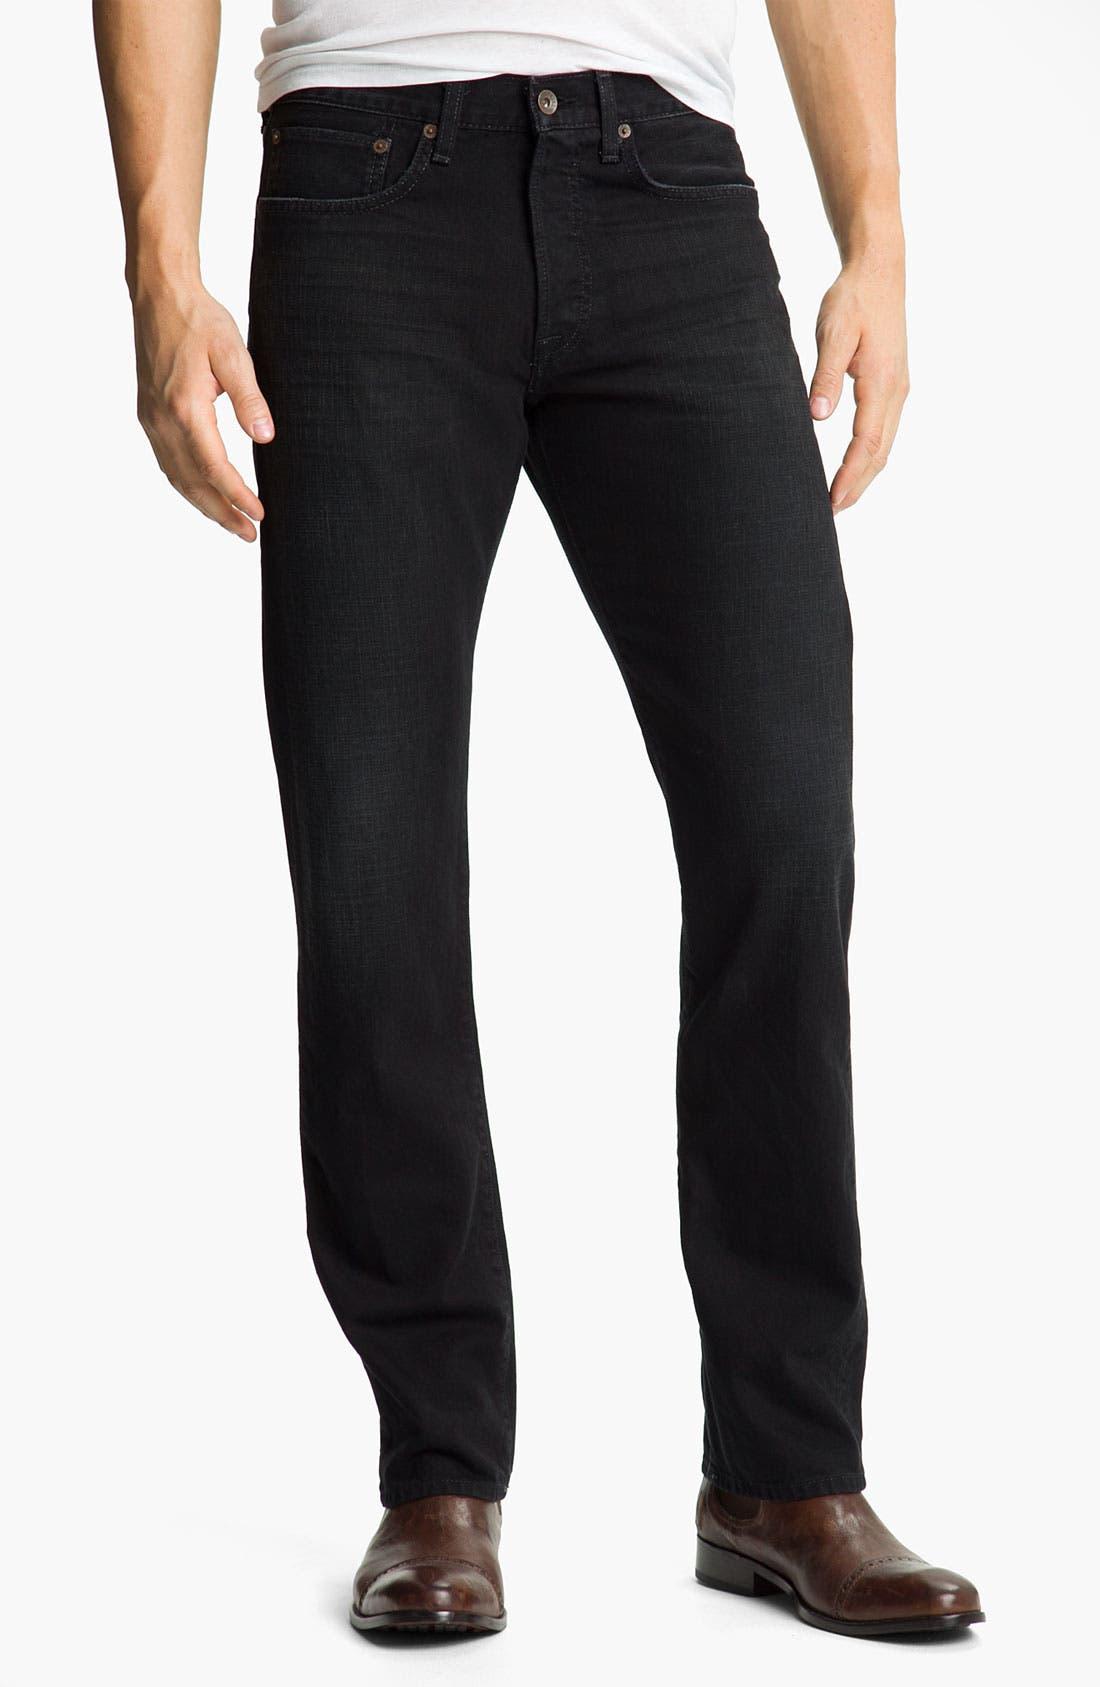 Alternate Image 1 Selected - Lucky Brand '121 Heritage' Slim Straight Leg Jeans (Ol' Subway)